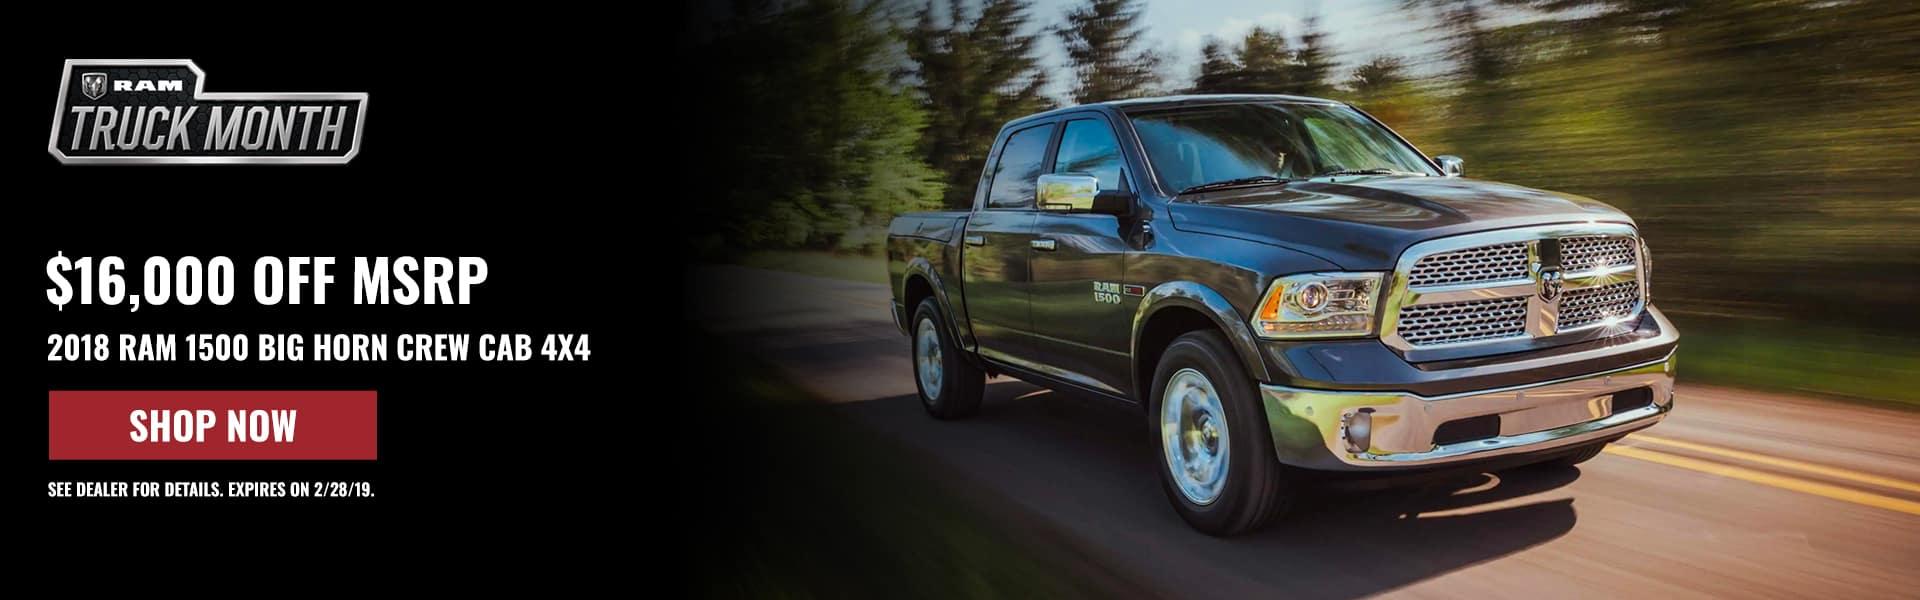 $16,000 off 2018 Ram 1500 Big Horn